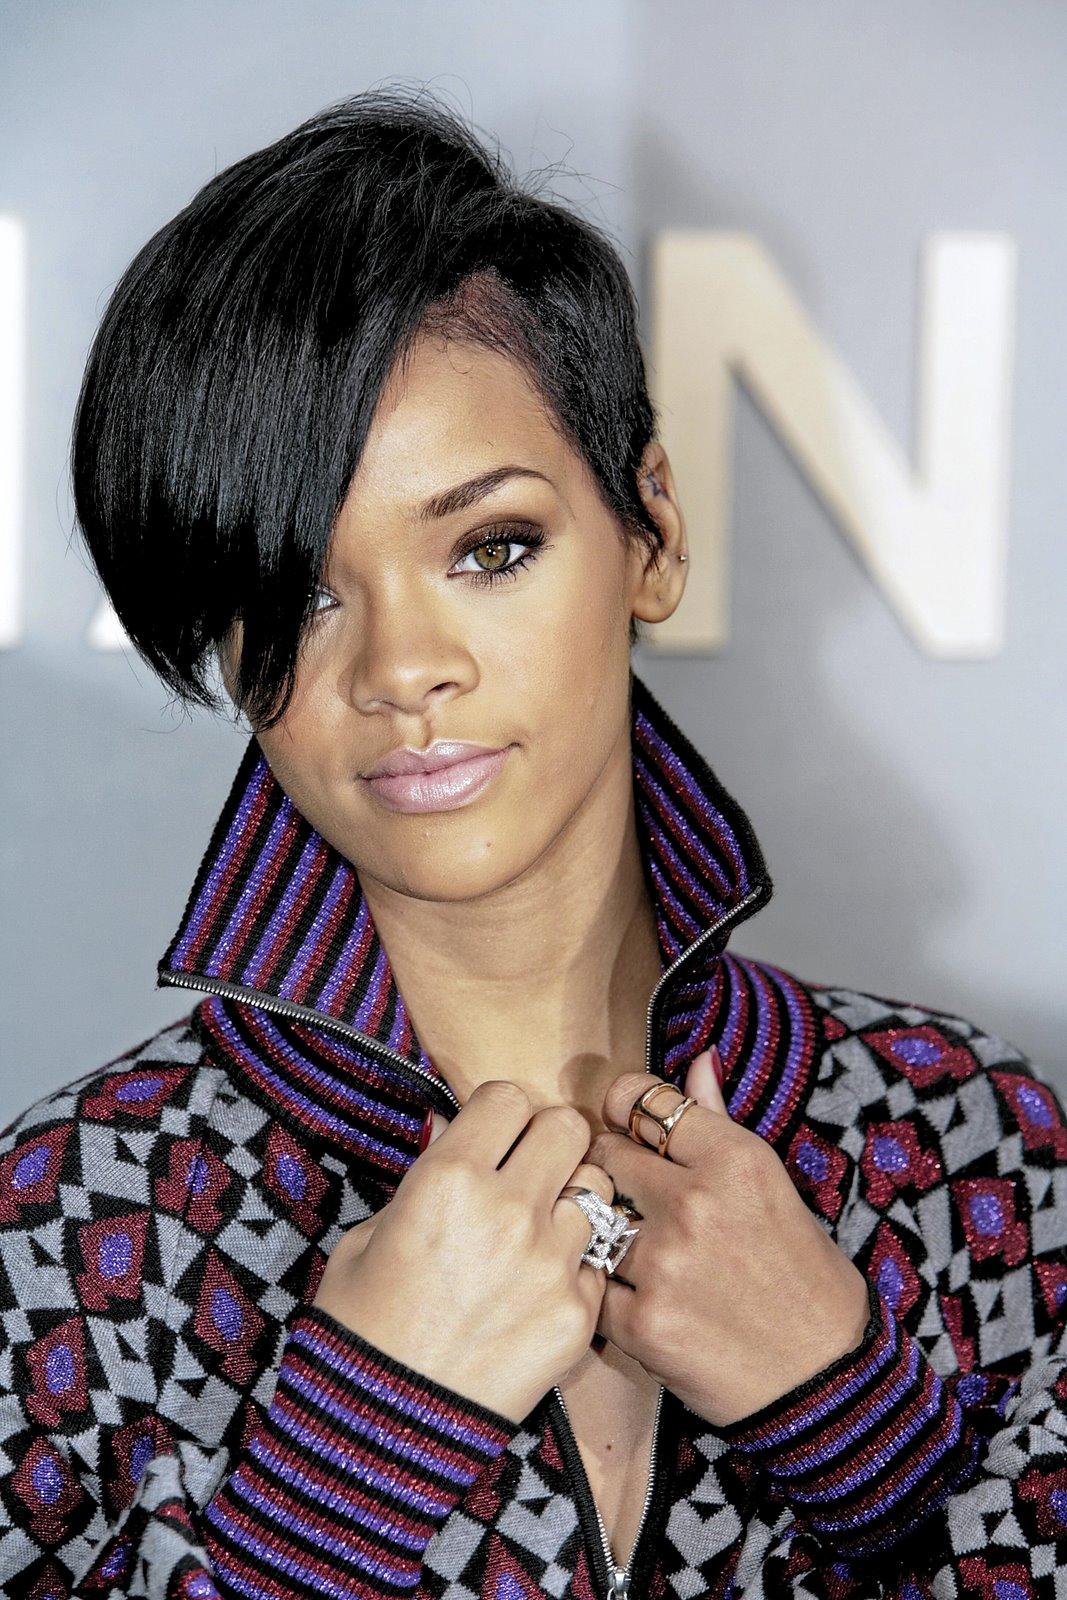 http://2.bp.blogspot.com/_NO2UOMMYKZ0/SUFU0aYxnbI/AAAAAAAADHI/cm1yh6_G3Vs/s1600/Rihanna%25252B-%25252BBlack%25252BHair.jpg